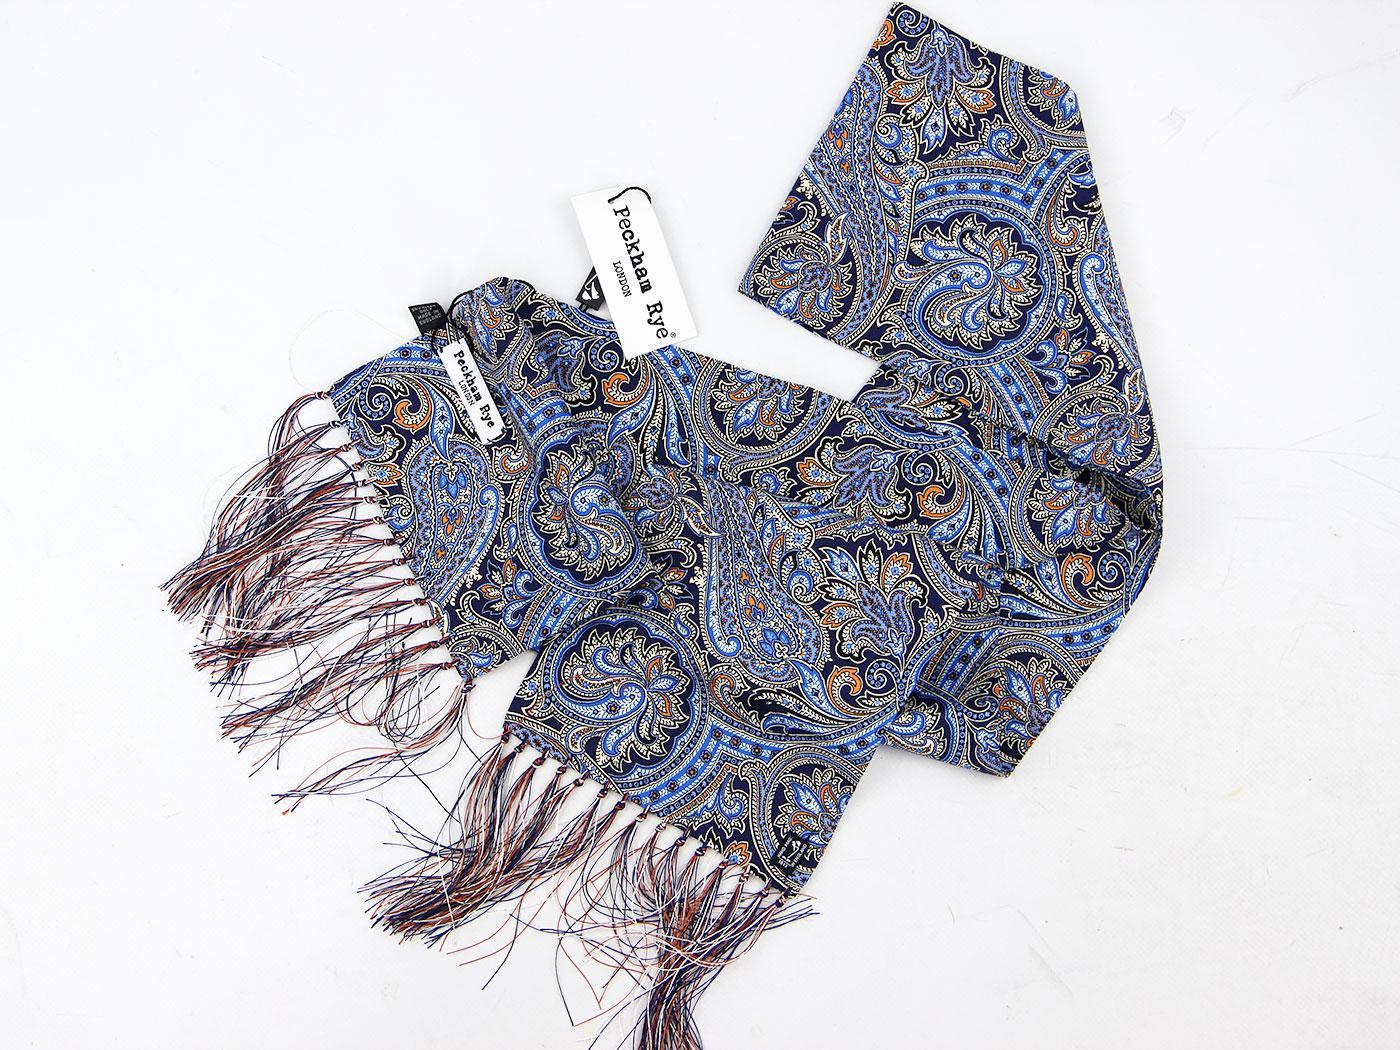 peckham rye matcham paisley retro mod scarf blue orange